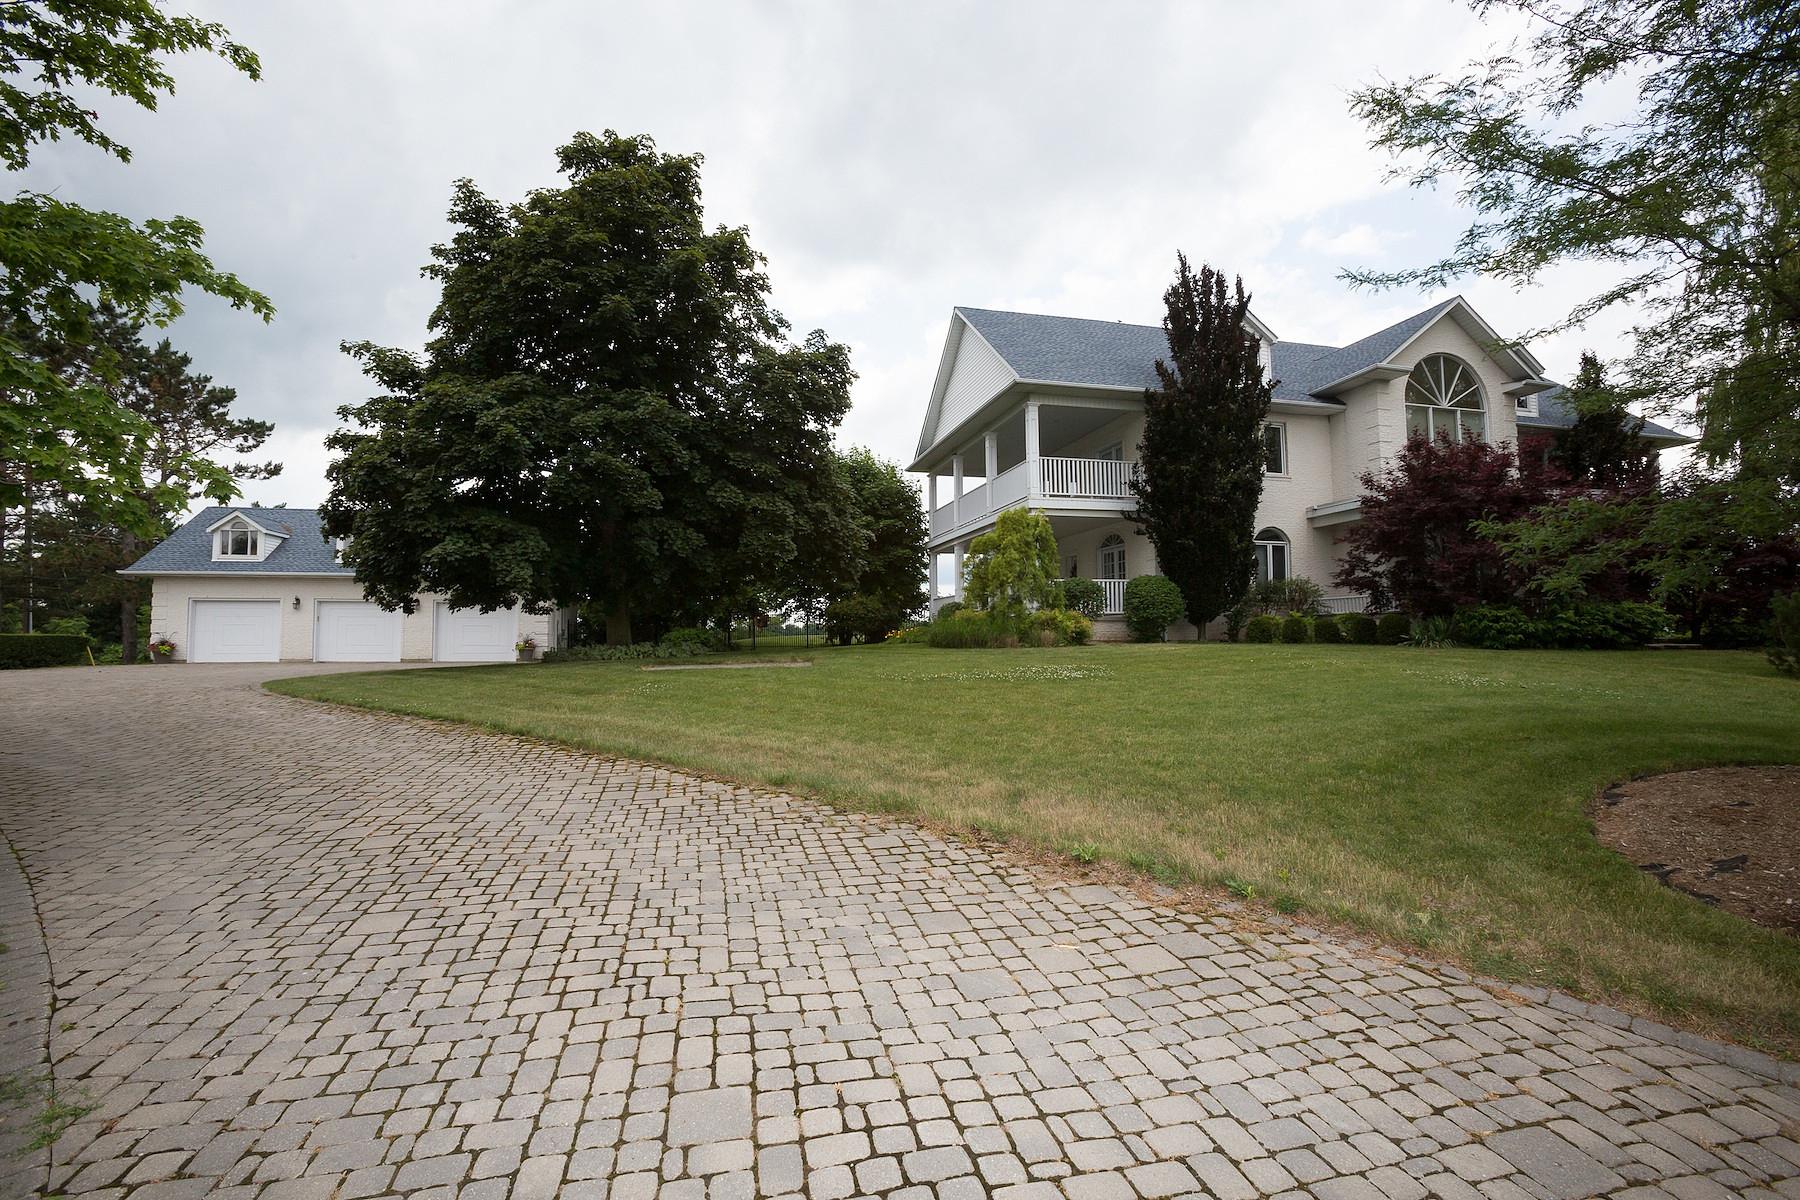 Maison unifamiliale pour l Vente à Brantford Equestrian Estate 91 Campbell Road Brantford, Ontario N3T 5L9 Canada